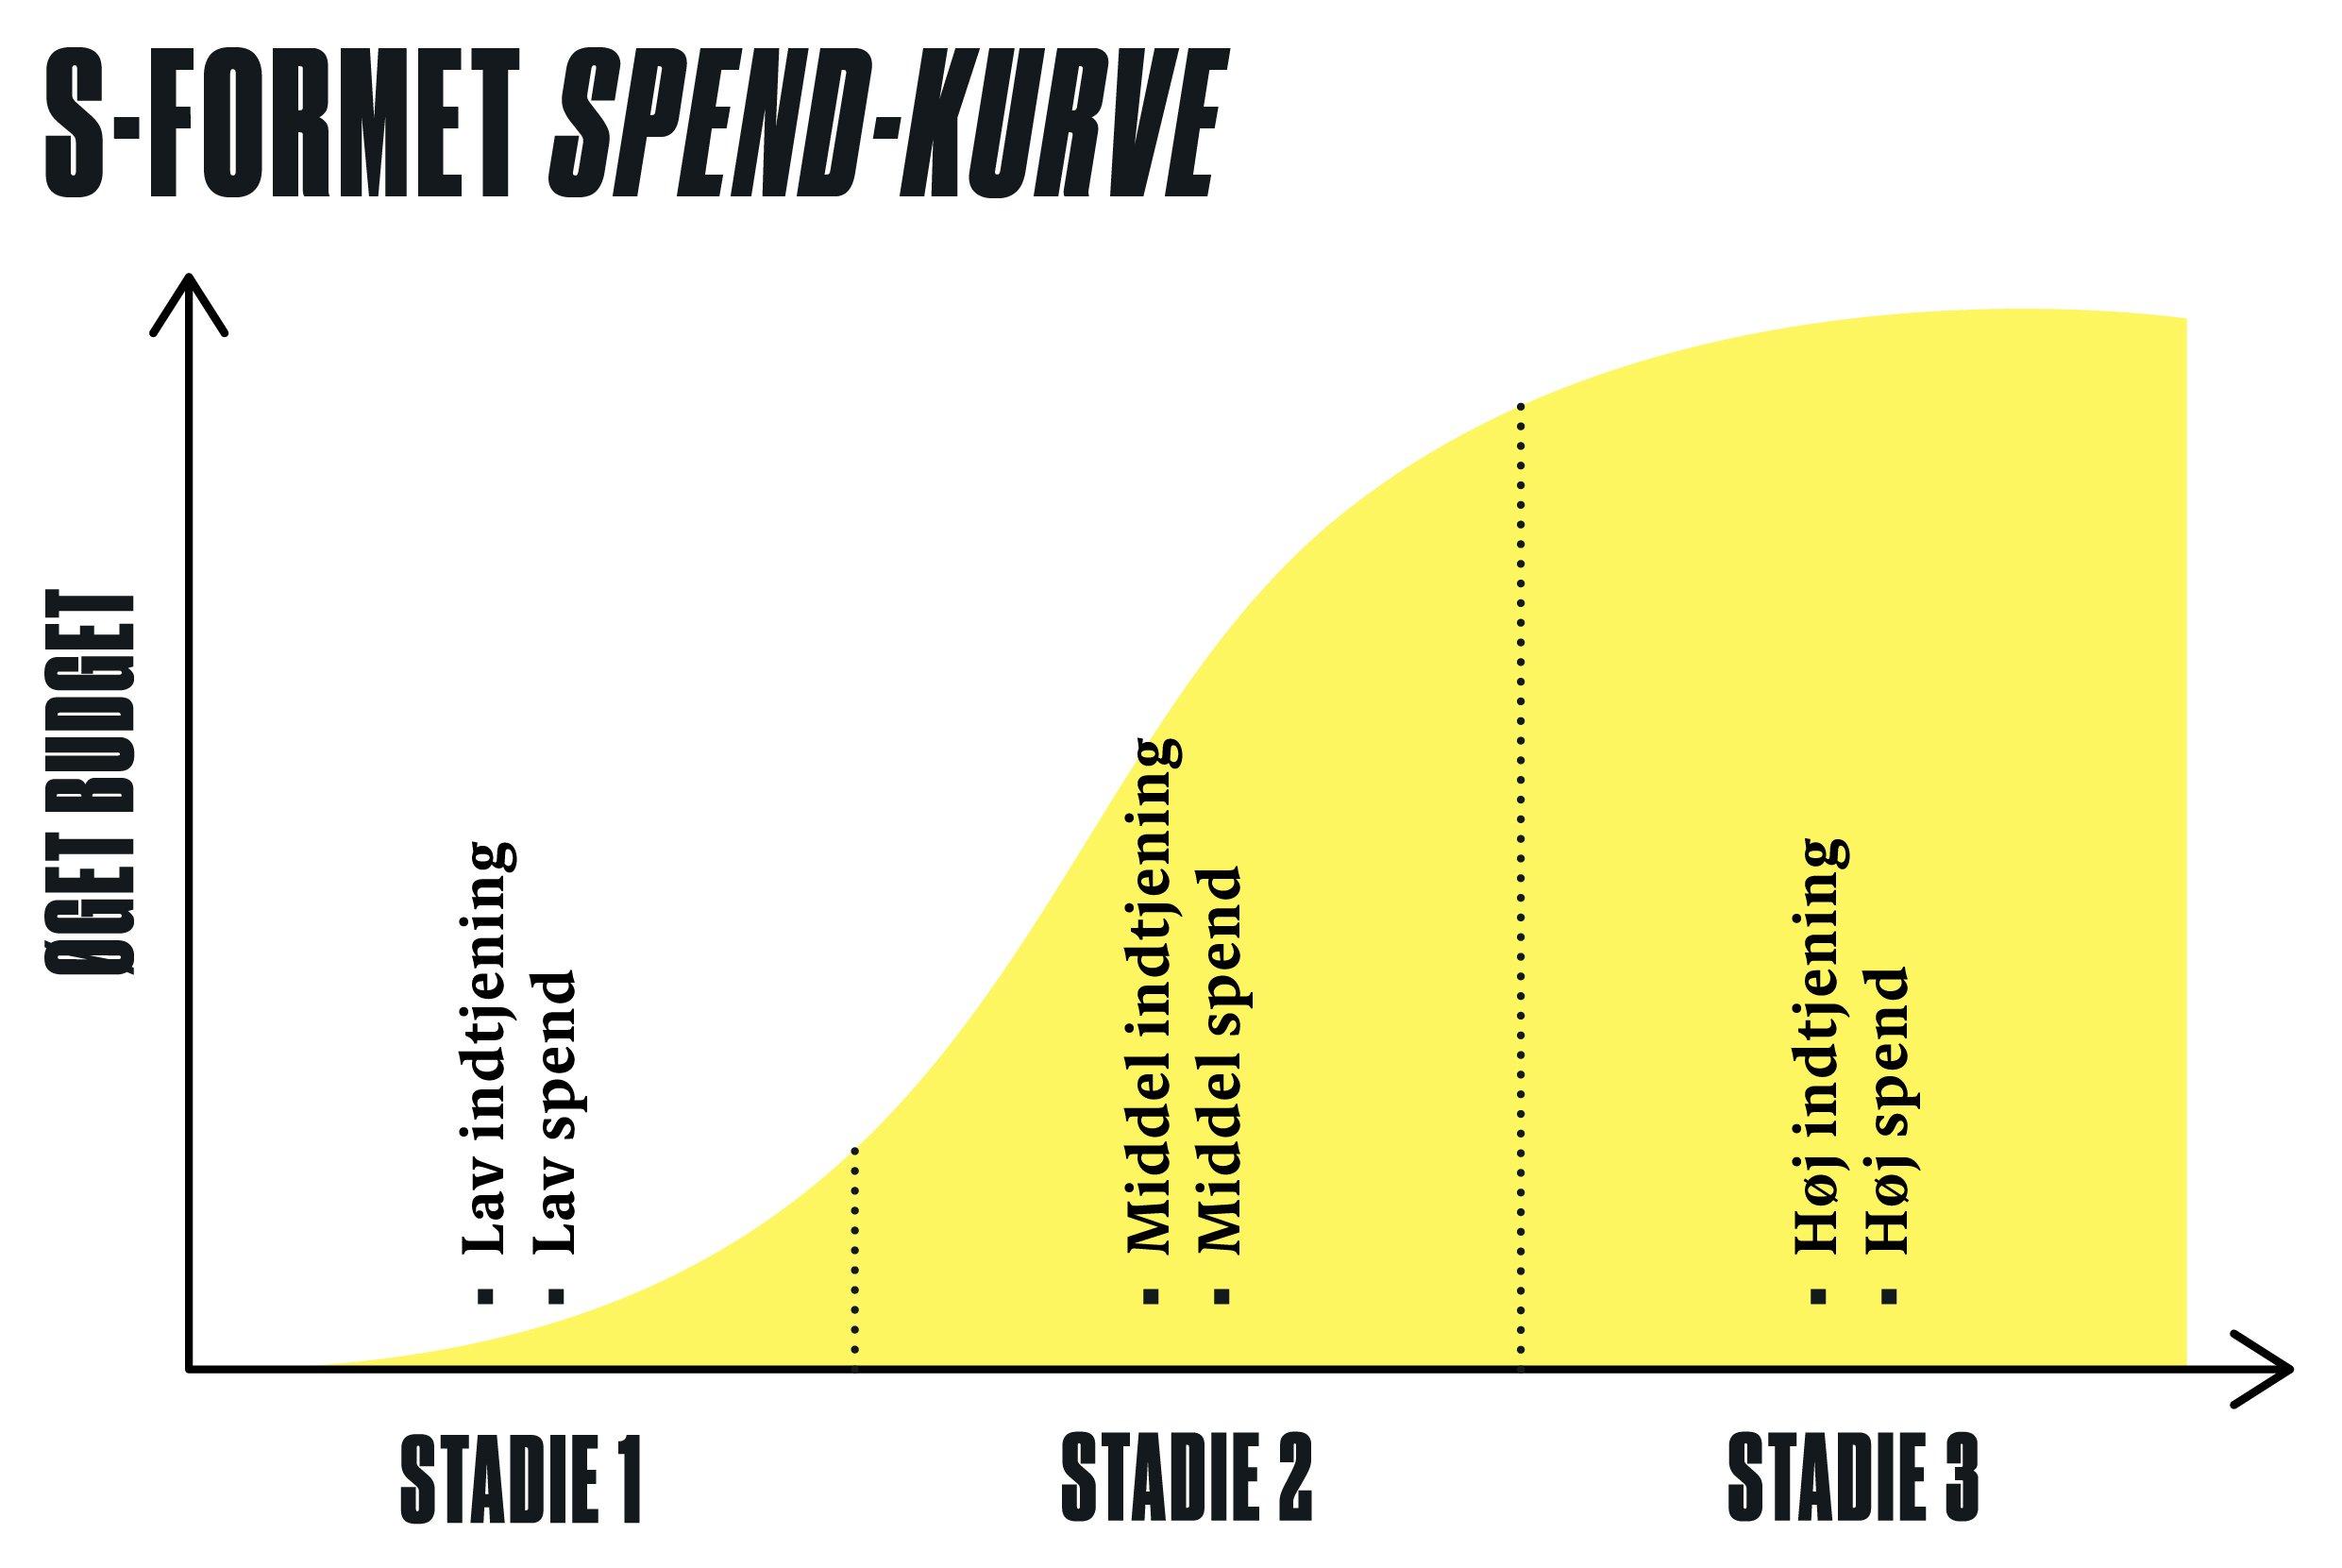 S-formet-spend-kurve